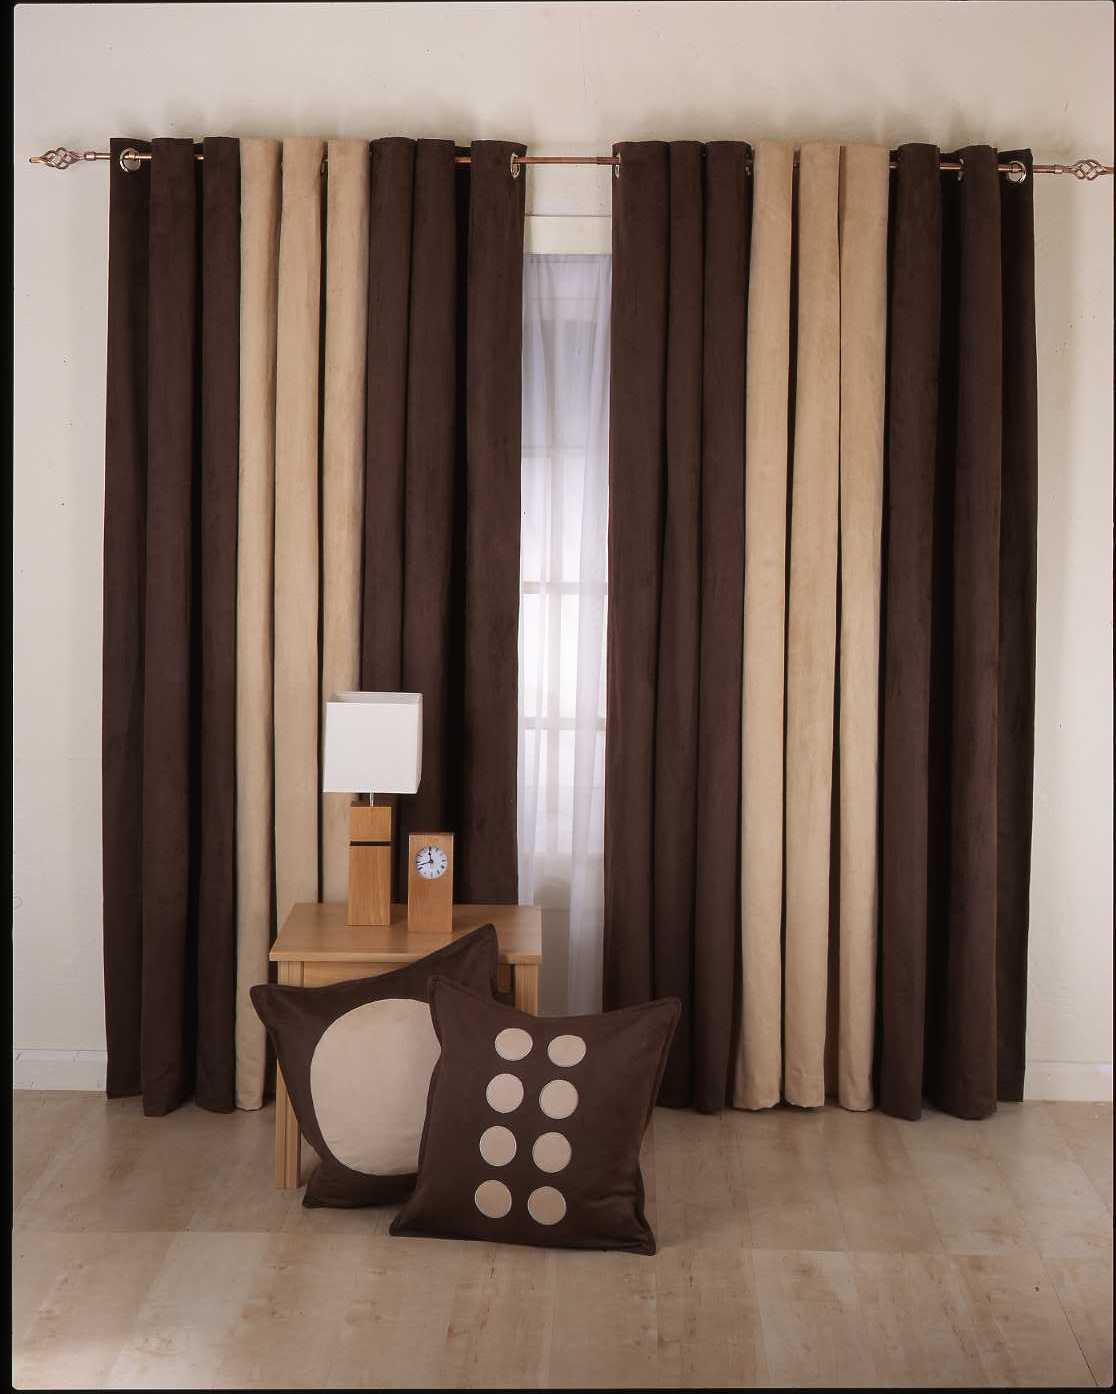 f0bdadfa4869a23d1a6b591370430938 20+ Hottest Curtain Designs for 2018